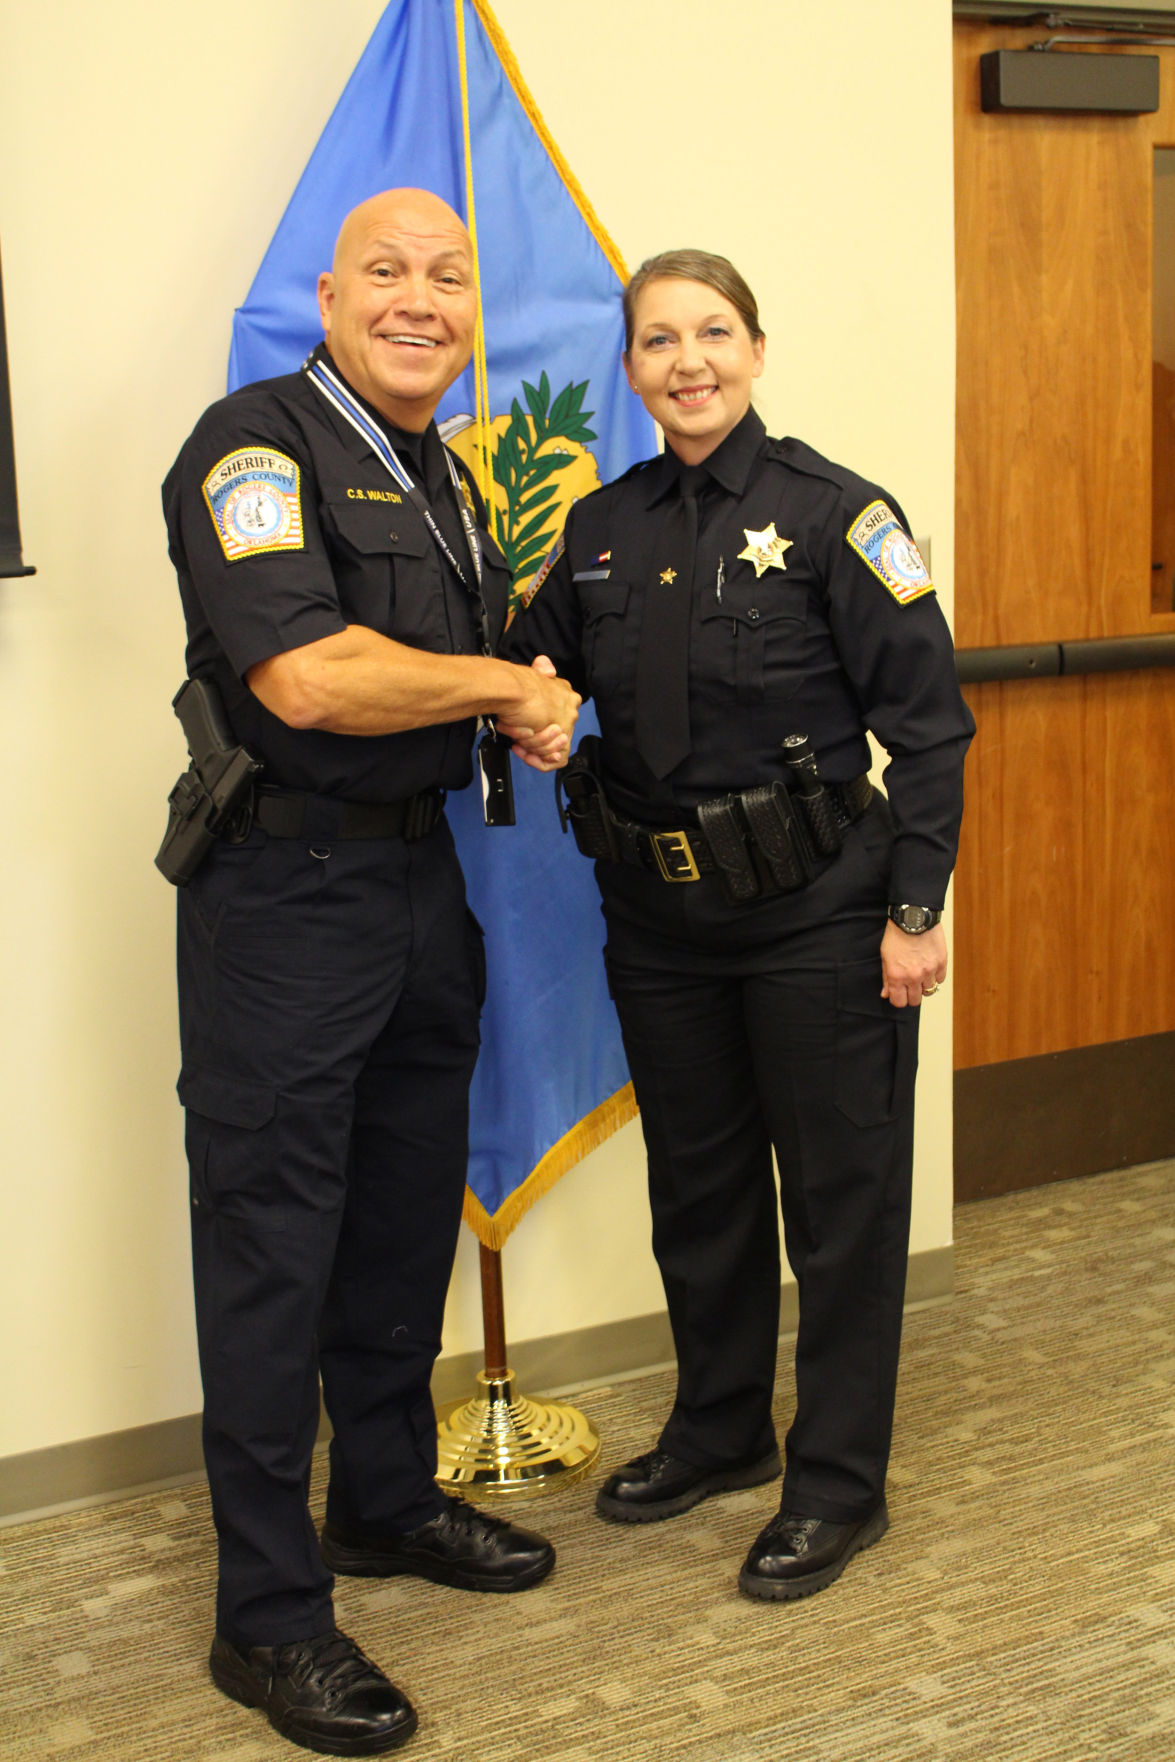 Sheriff Scott Walton welcomes Betty Shelby